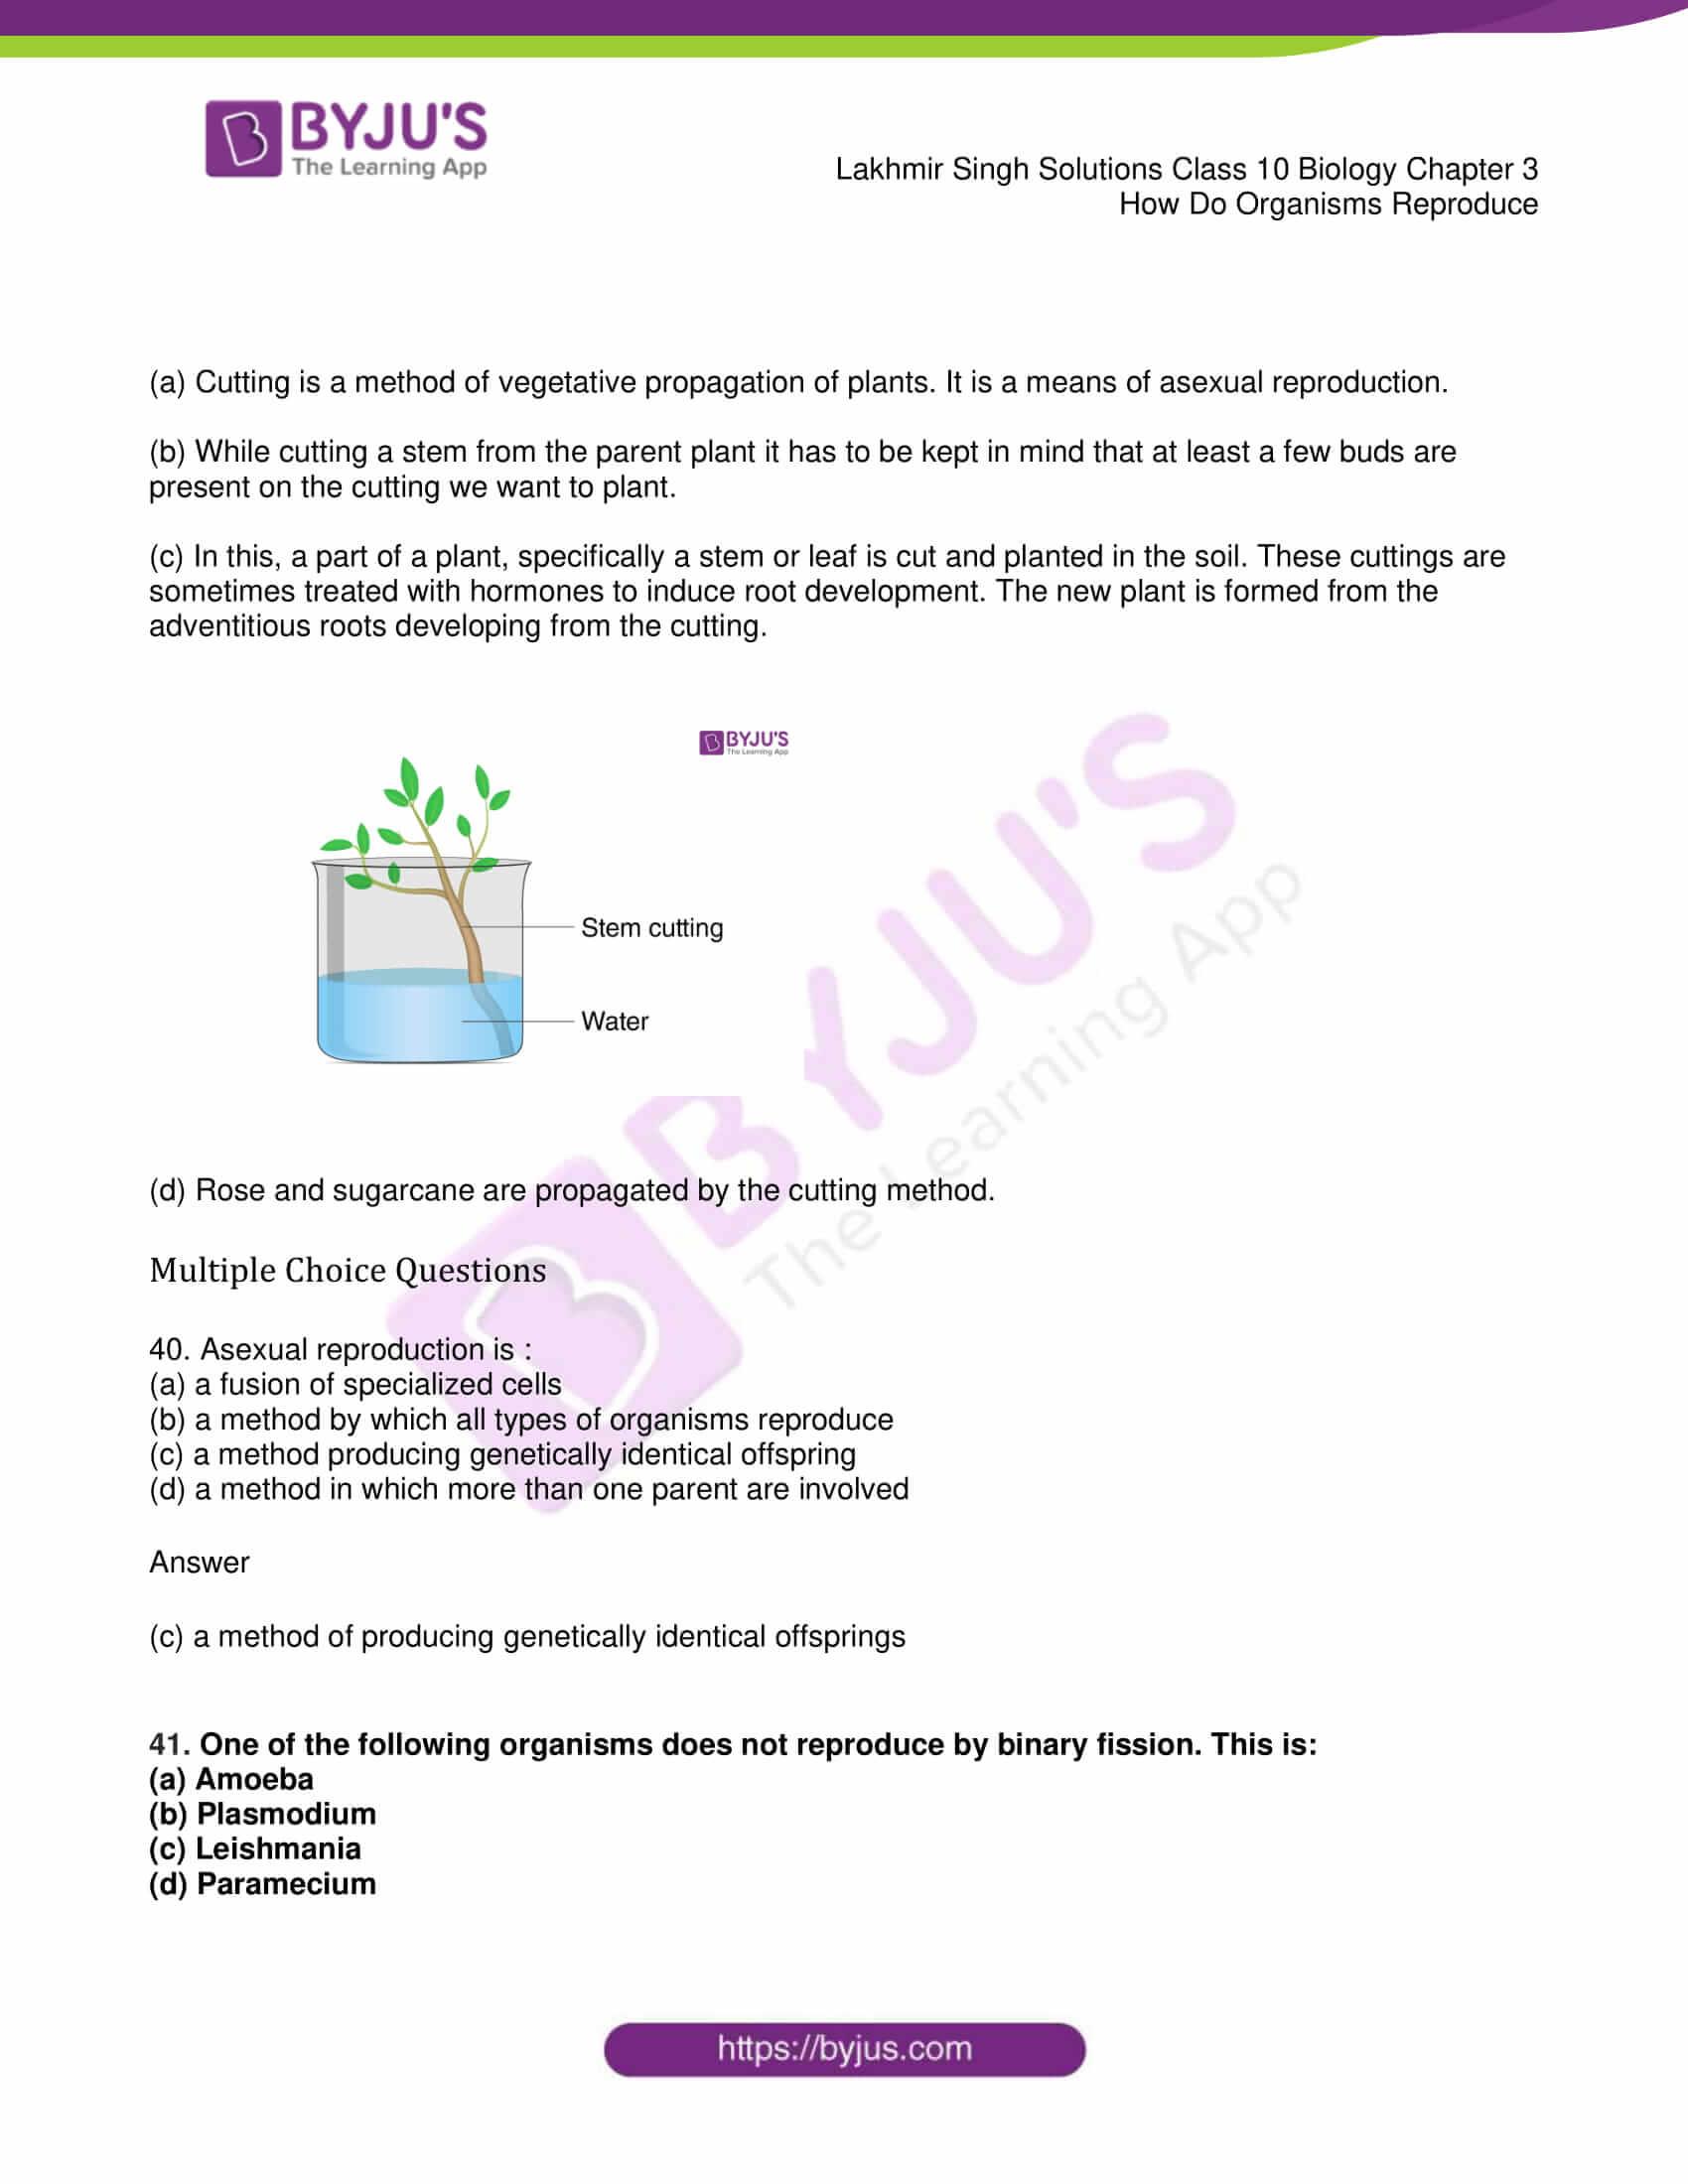 lakhmir singh solutions class 10 biology chapter 3 16